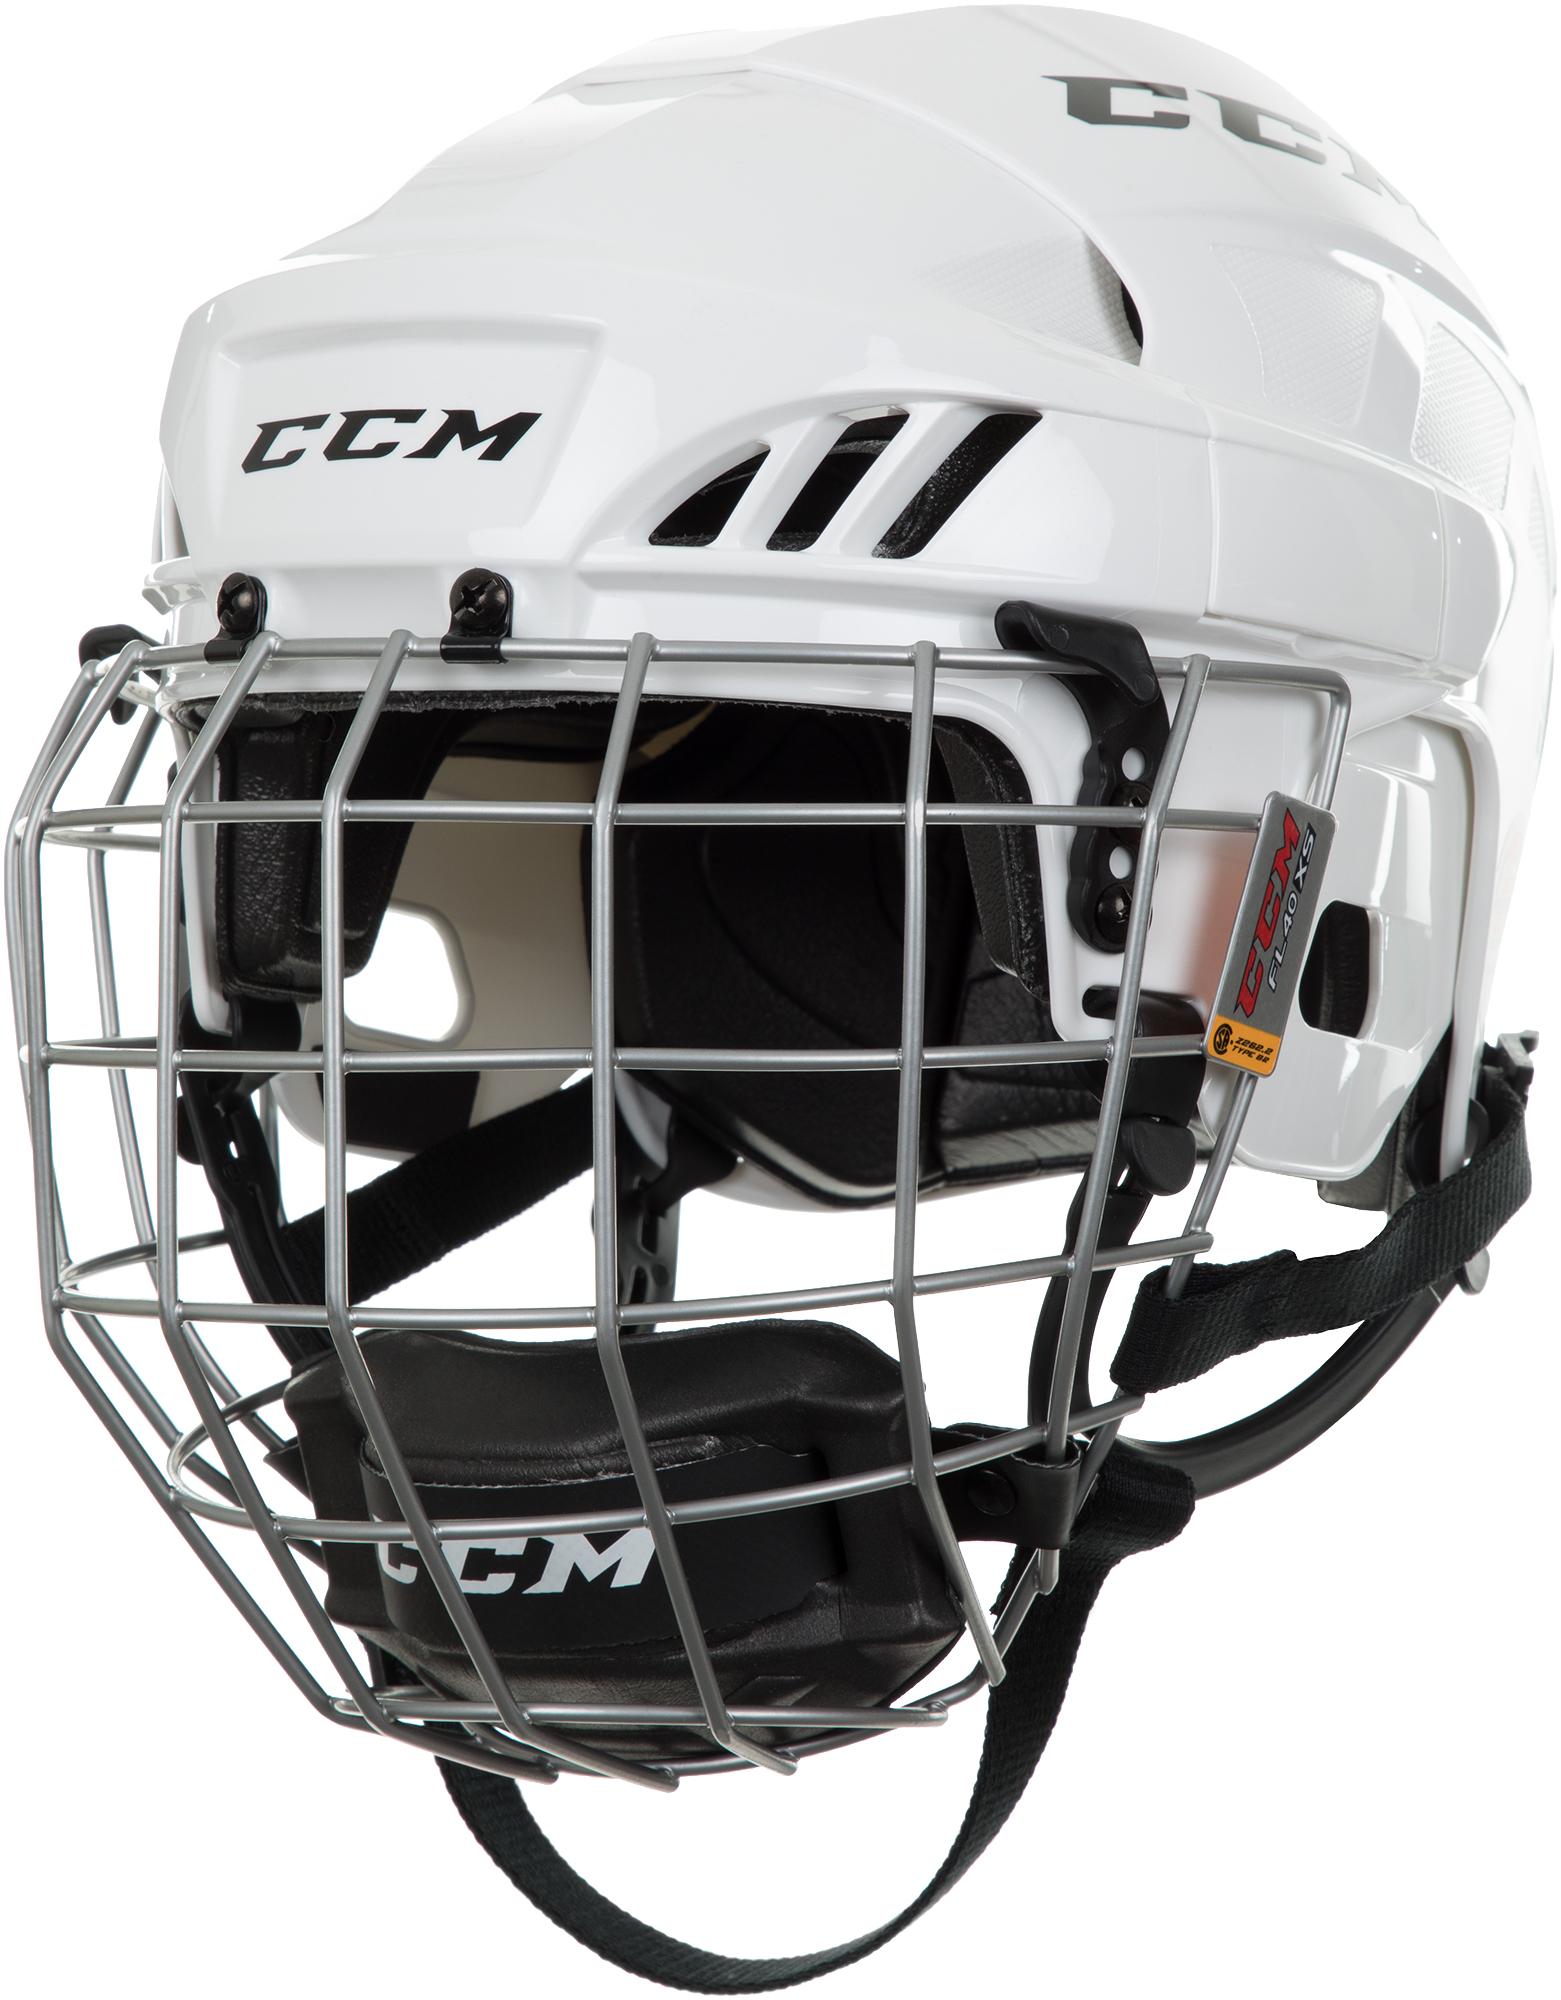 CCM Шлем хоккейный детский CCM HTC FITLITE 40, размер 48-53 ccm шлем хоккейный ccm tacks 310